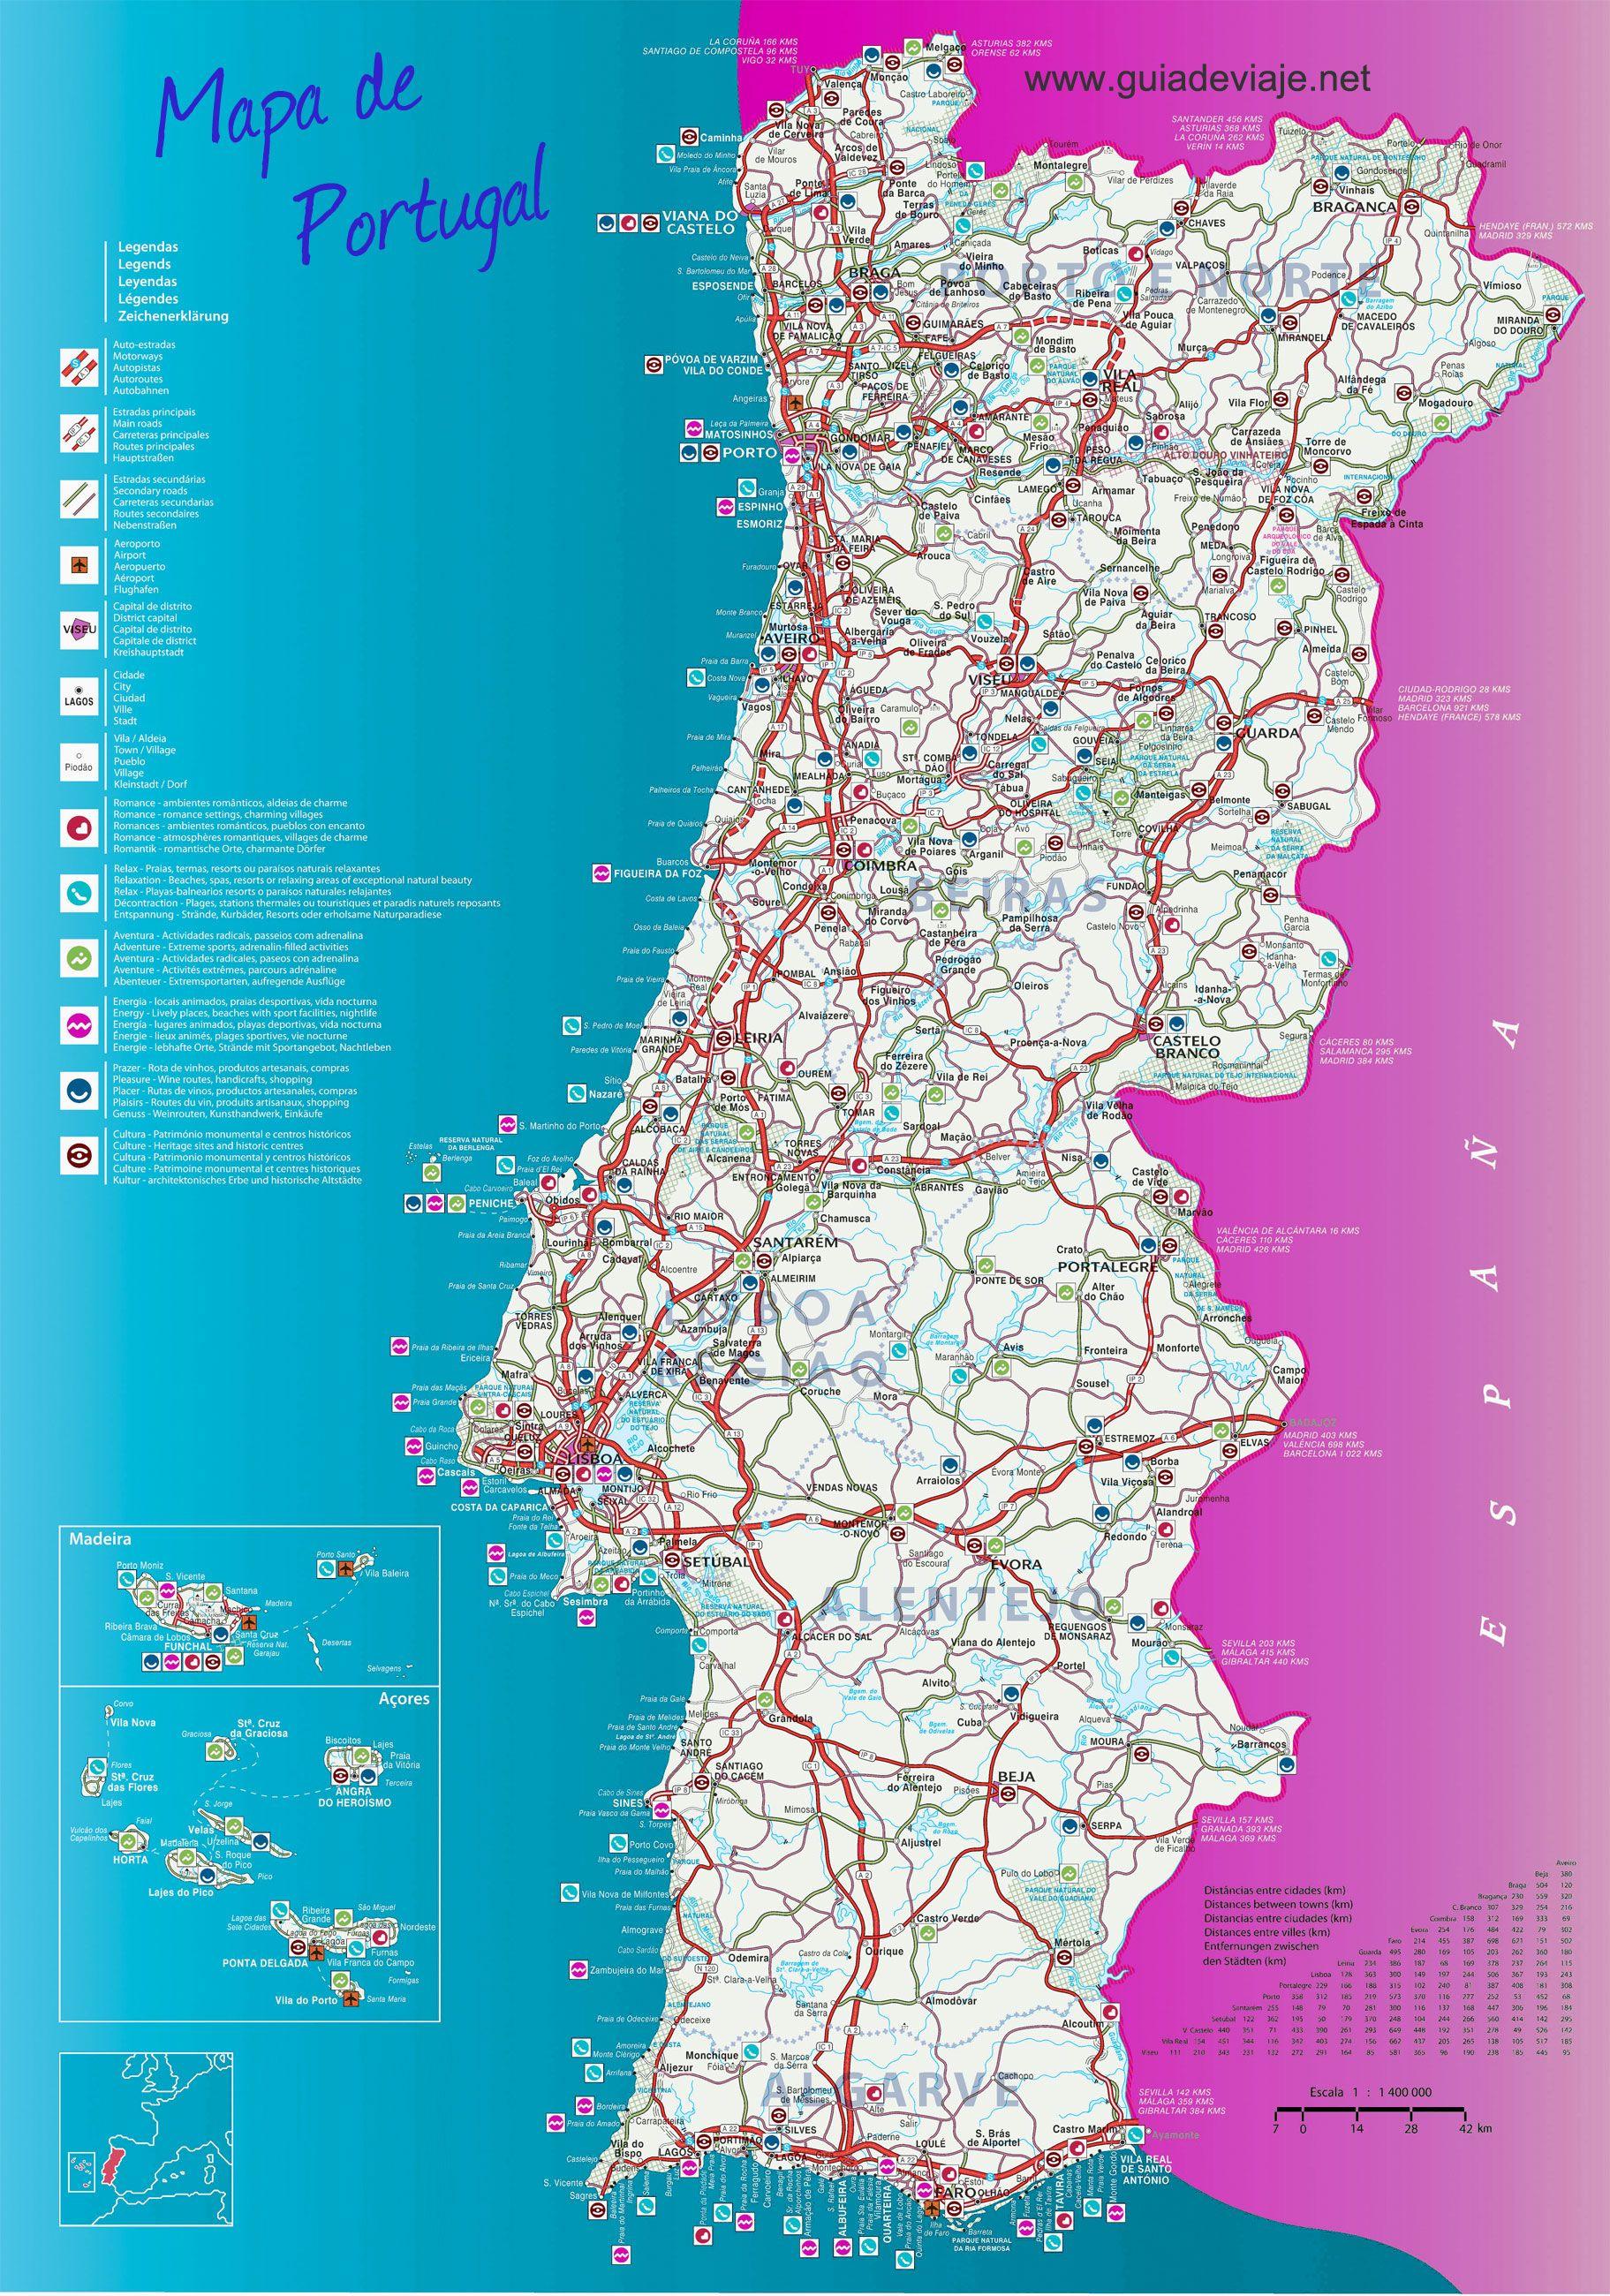 Mapa De Portugal Completo.Mapa De Portugal Completo Mapa Em 2019 Mapa De Portugal